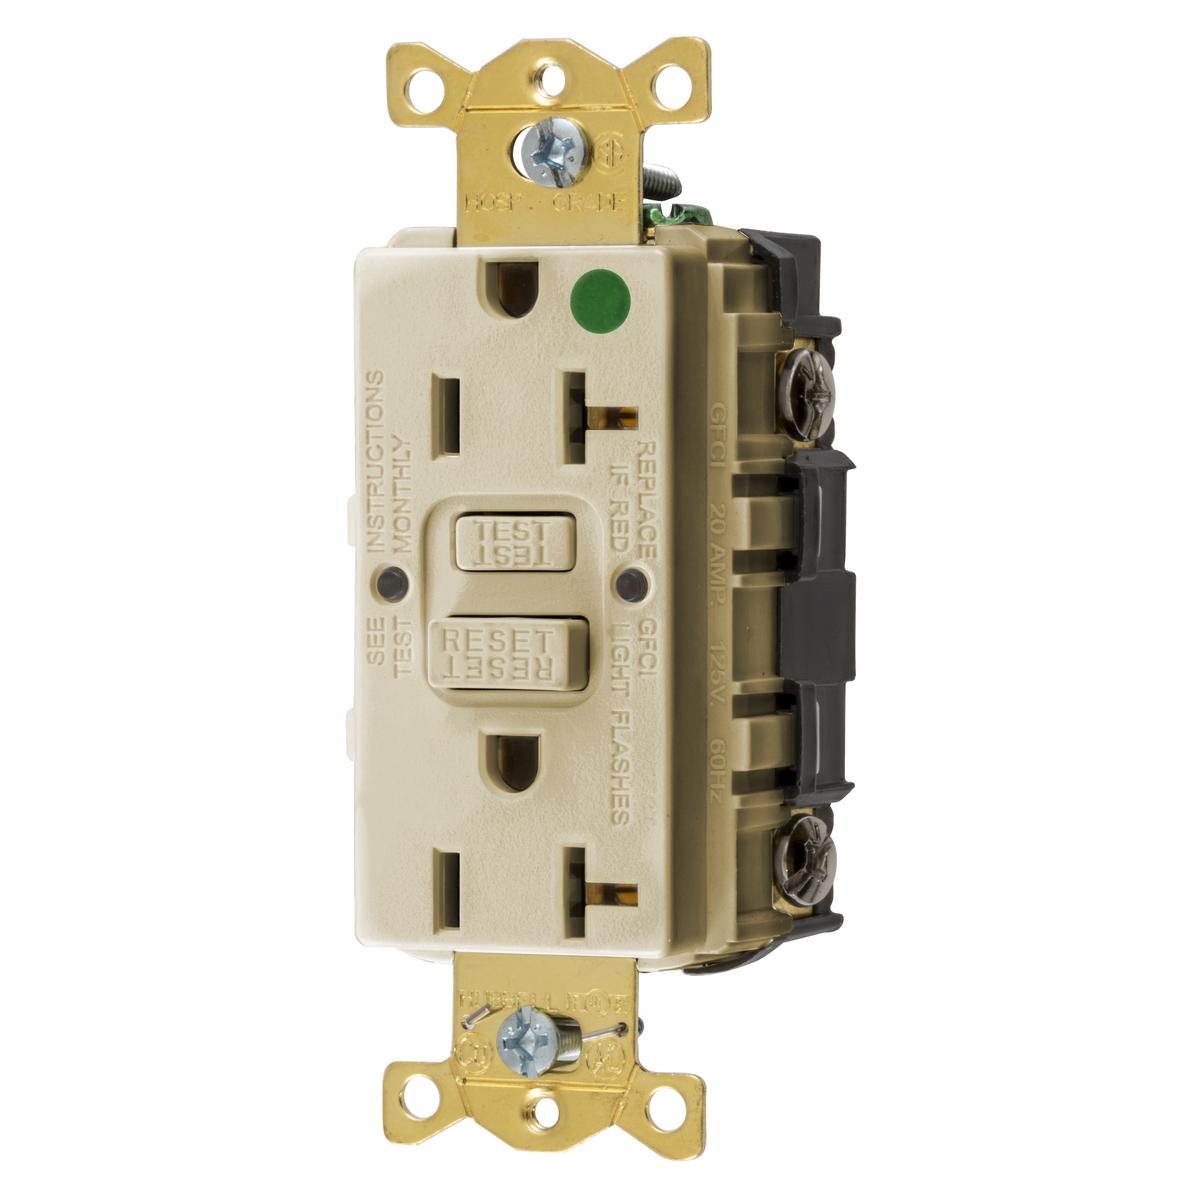 Hubbell GFRST83I 20 Amp 125 Volt NEMA 5-20R Ivory Commercial Standard GFCI Receptacle